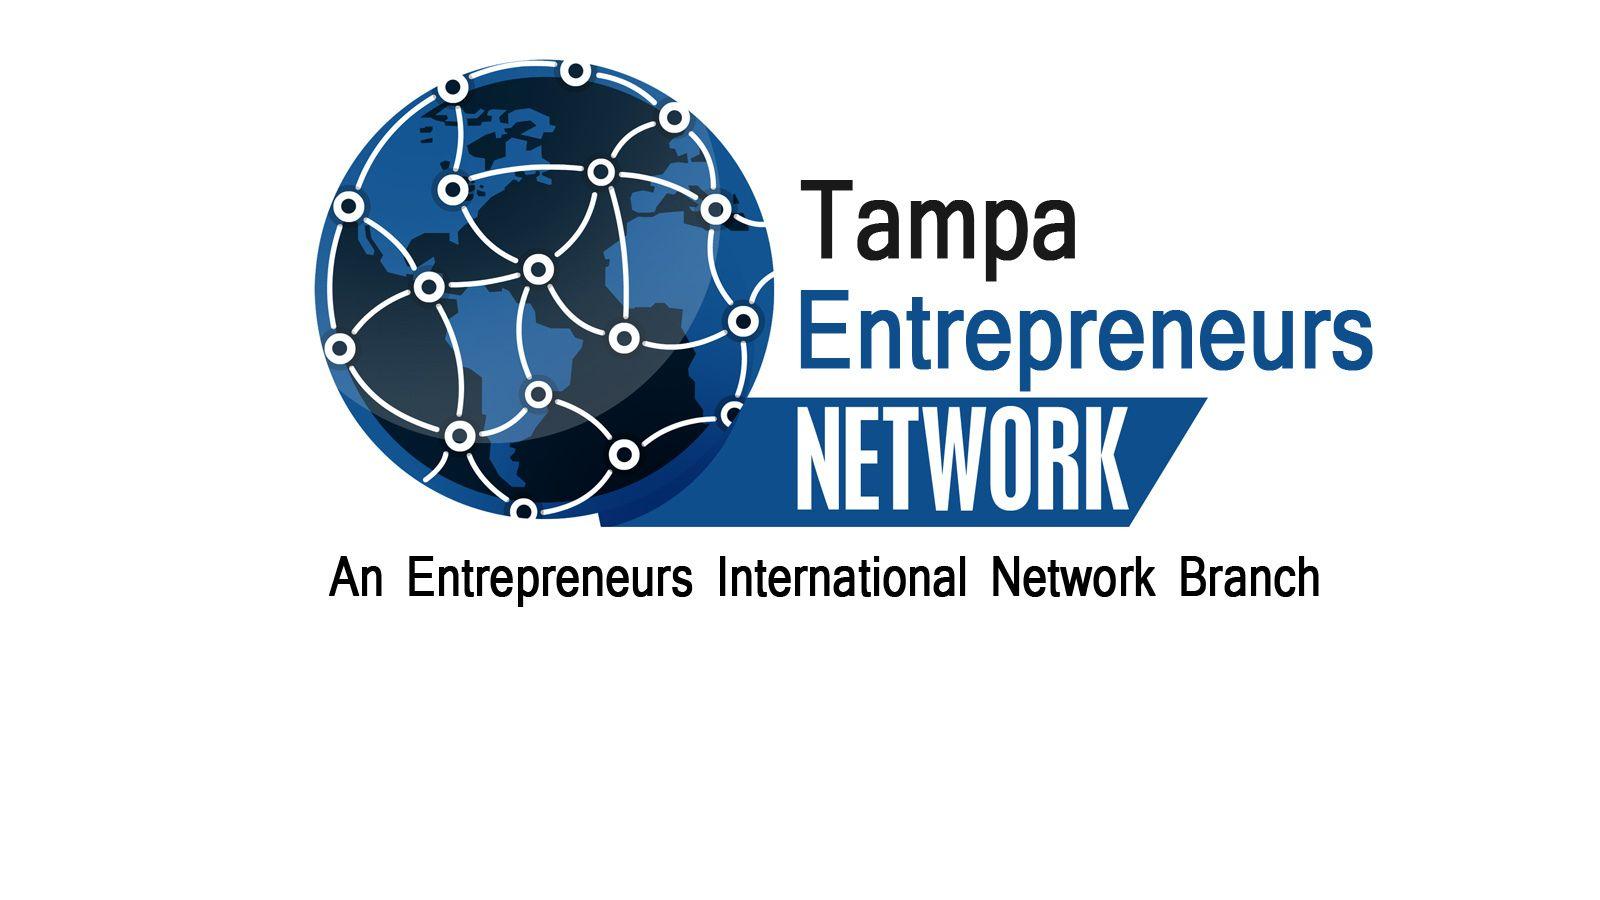 Tampa Entrepreneurs Network